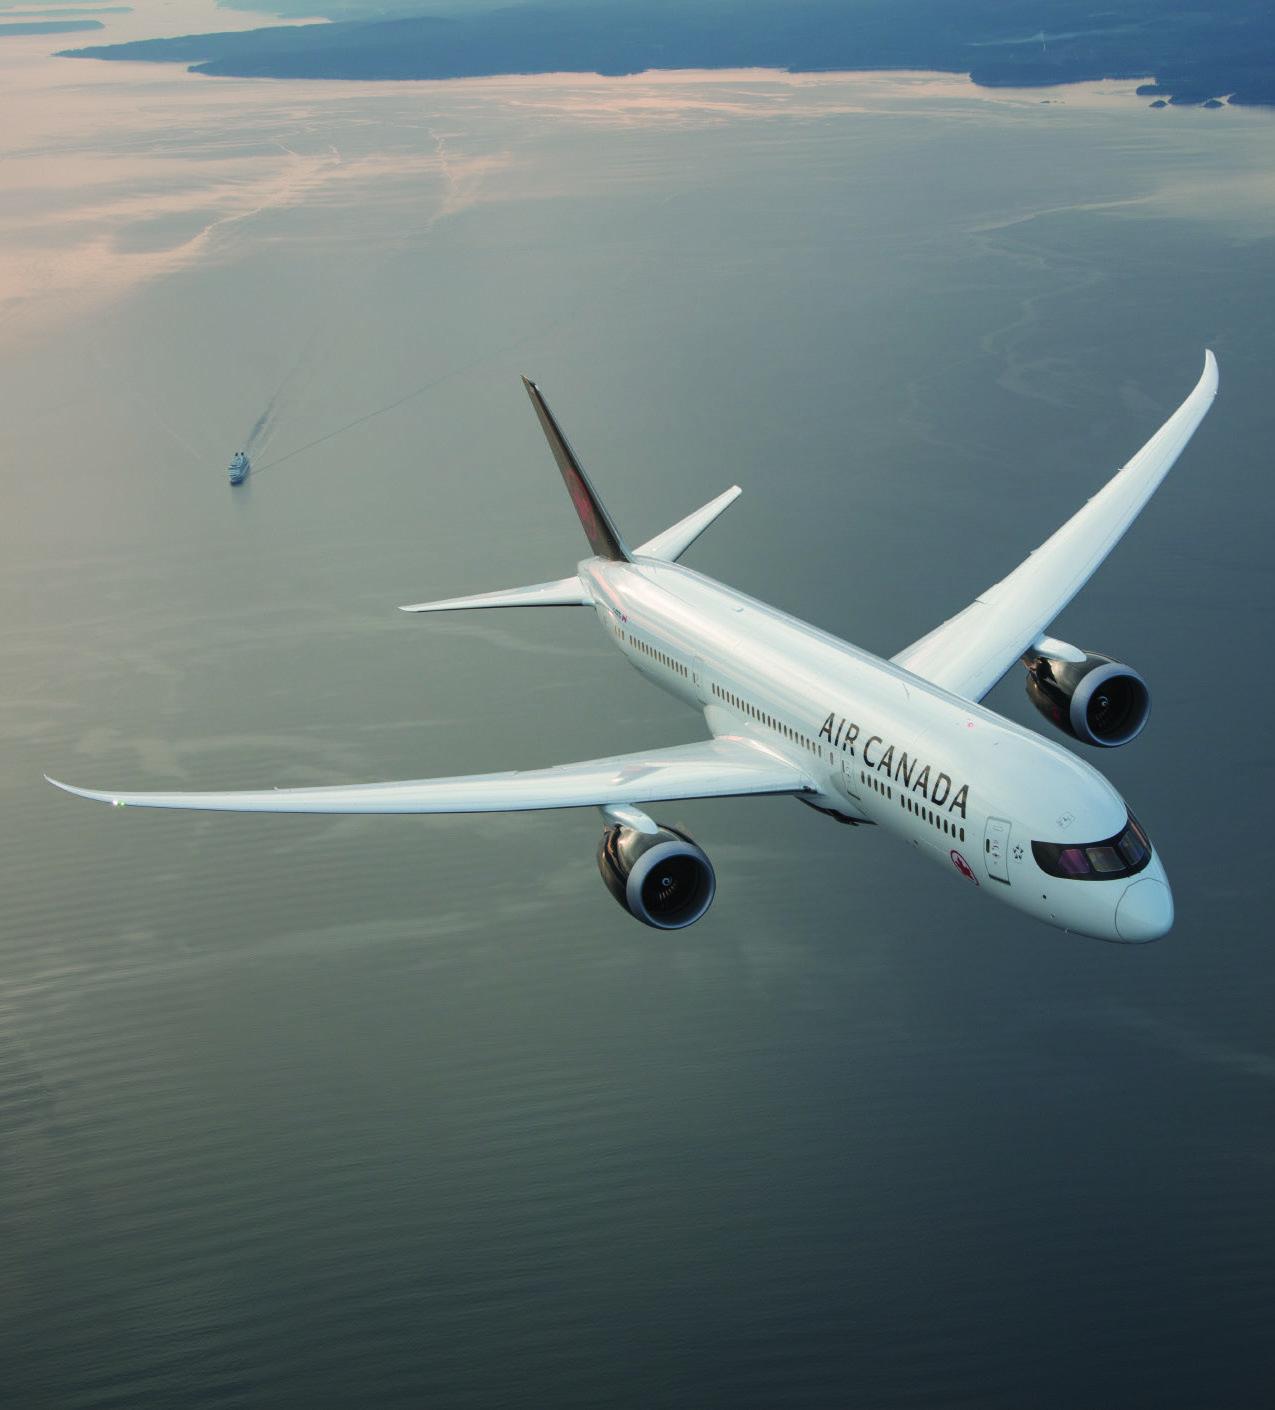 Air Canada_Page_01_Image_0001.jpg